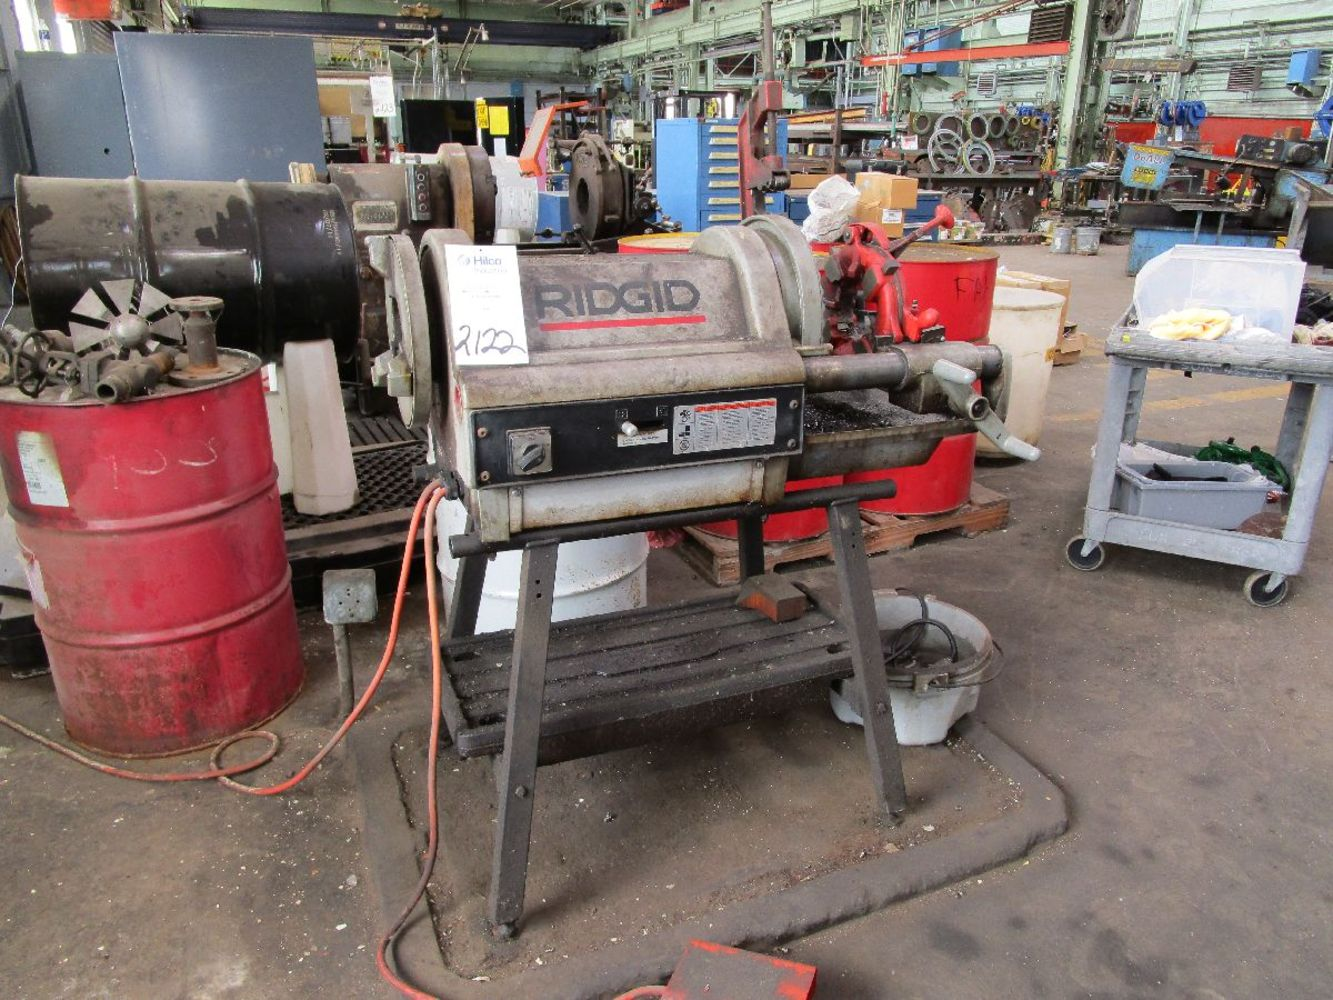 3-Day Auction: (2) Complete Metal Fabrication & Machine Shops (Philadelphia Energy Solutions Sale #2)